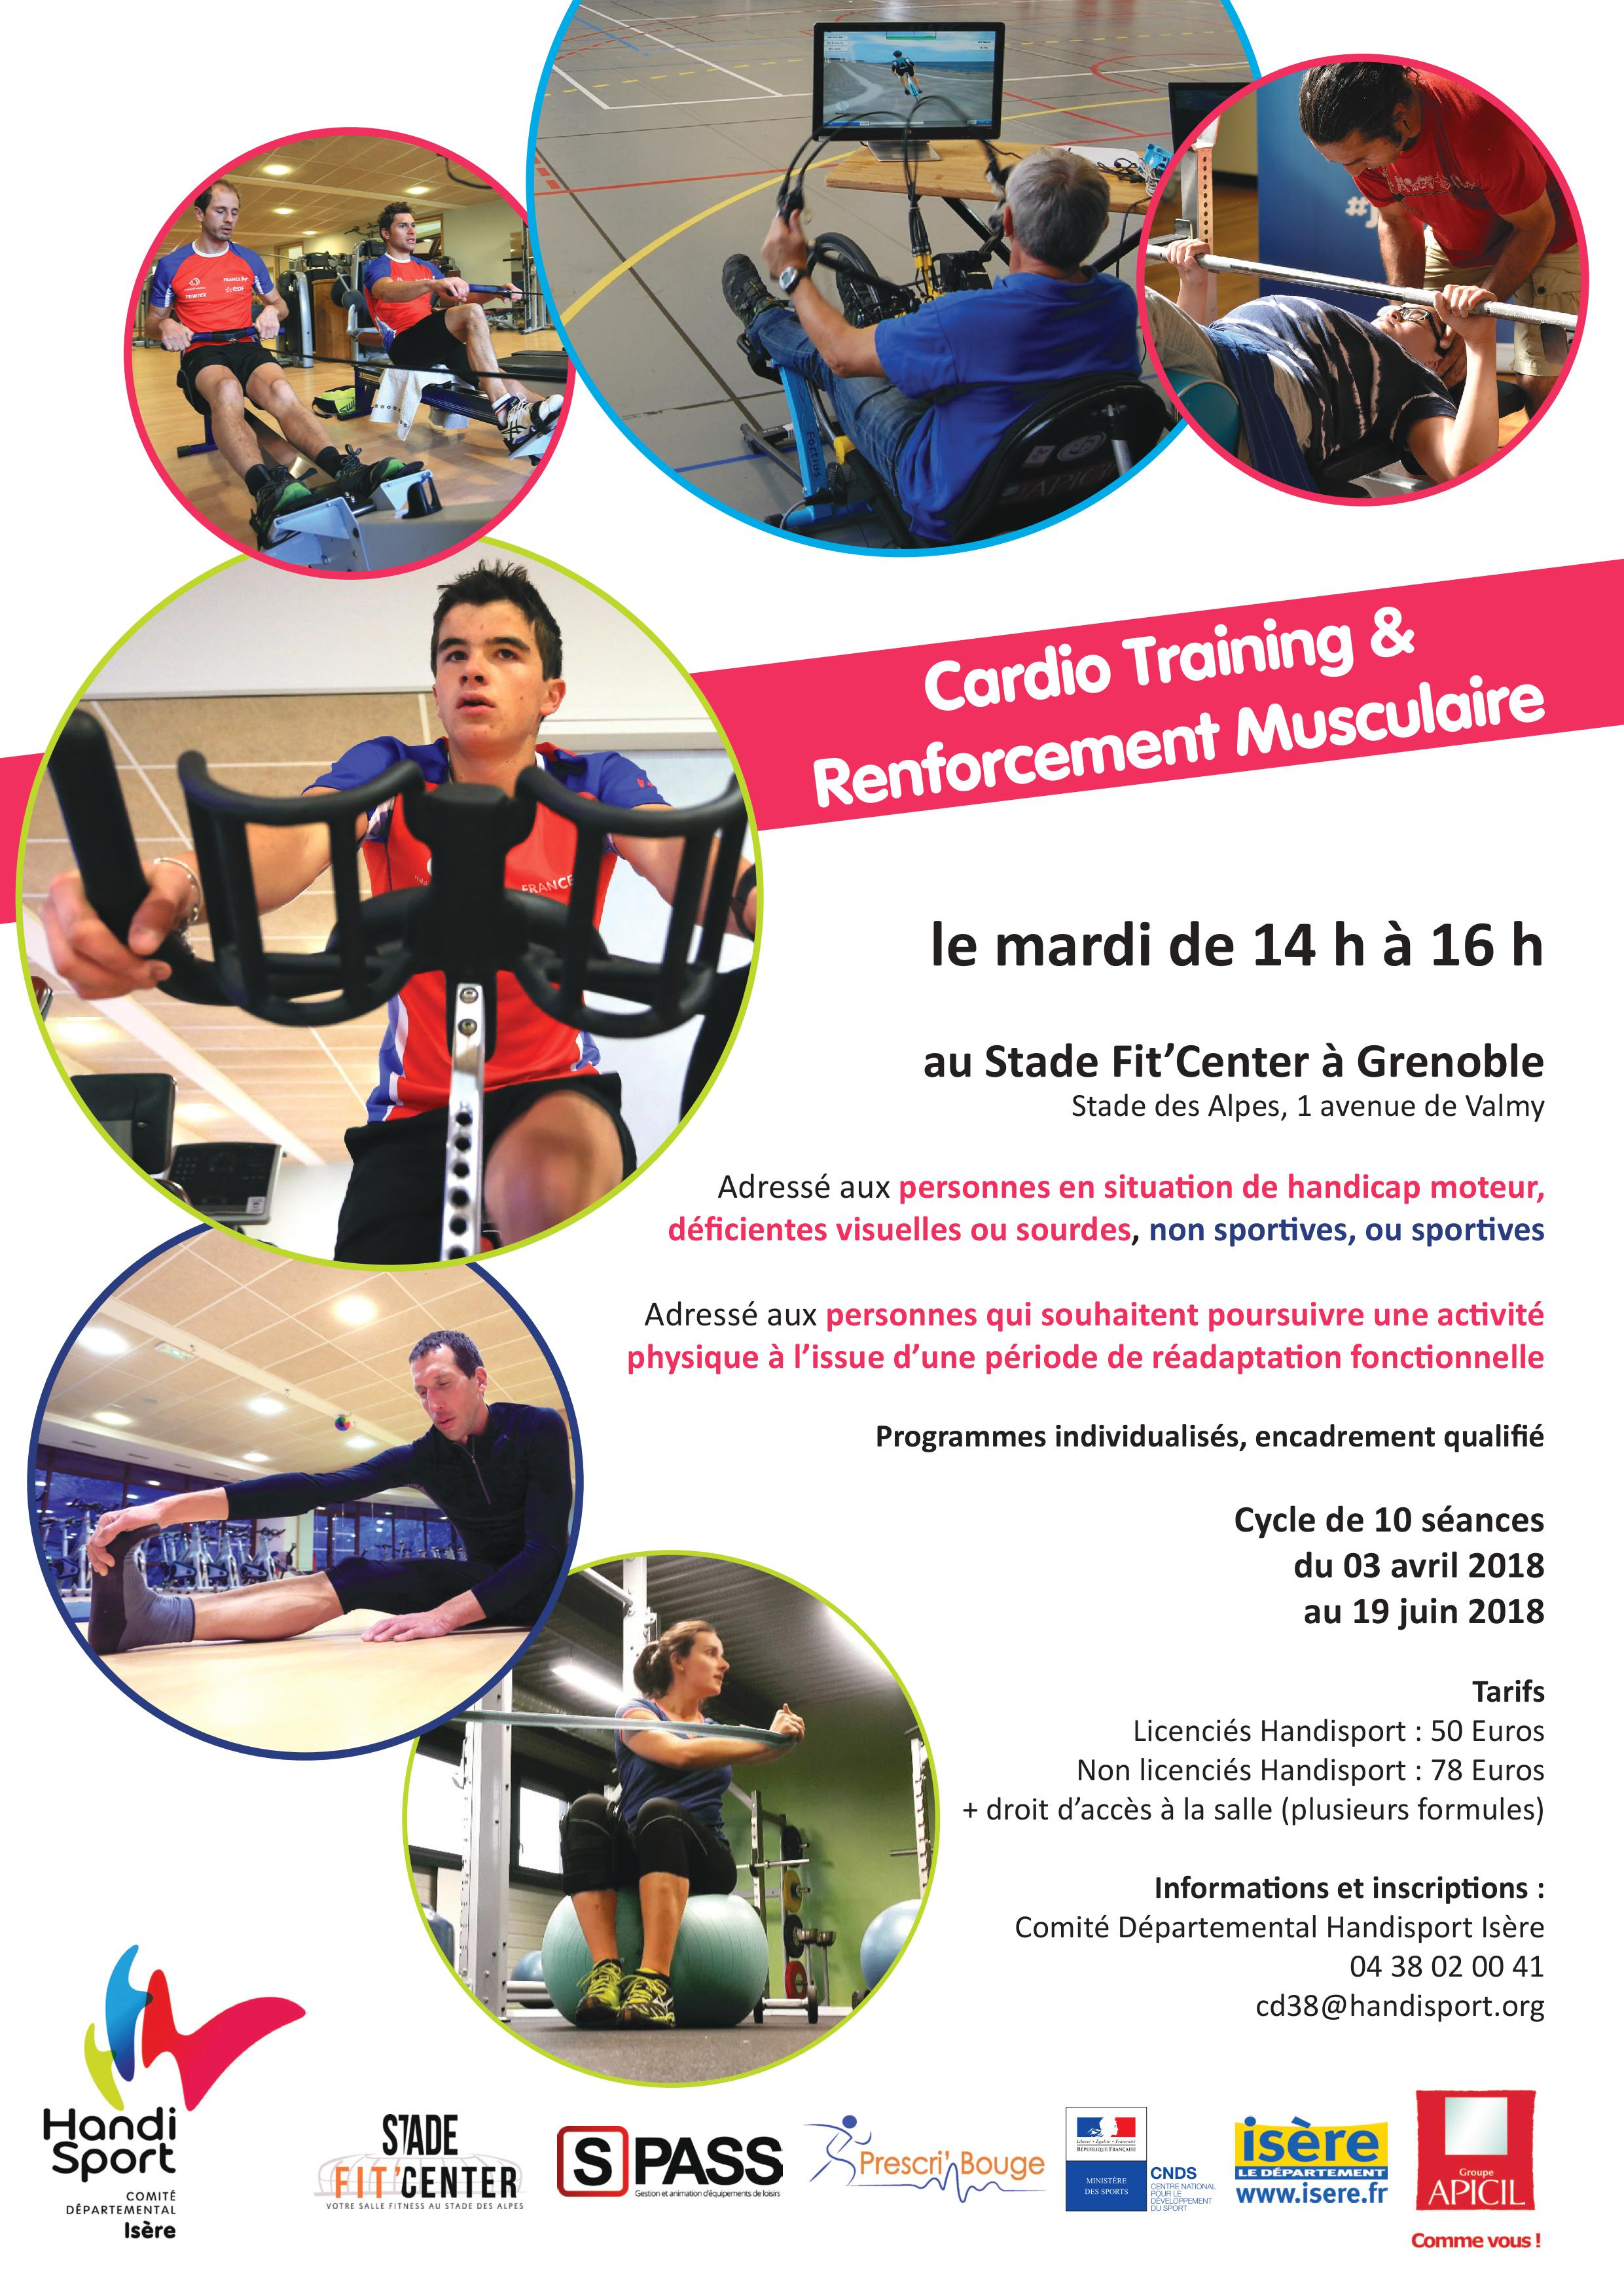 Atelier-CarioTraining&RenforementMusculaire-Handisport